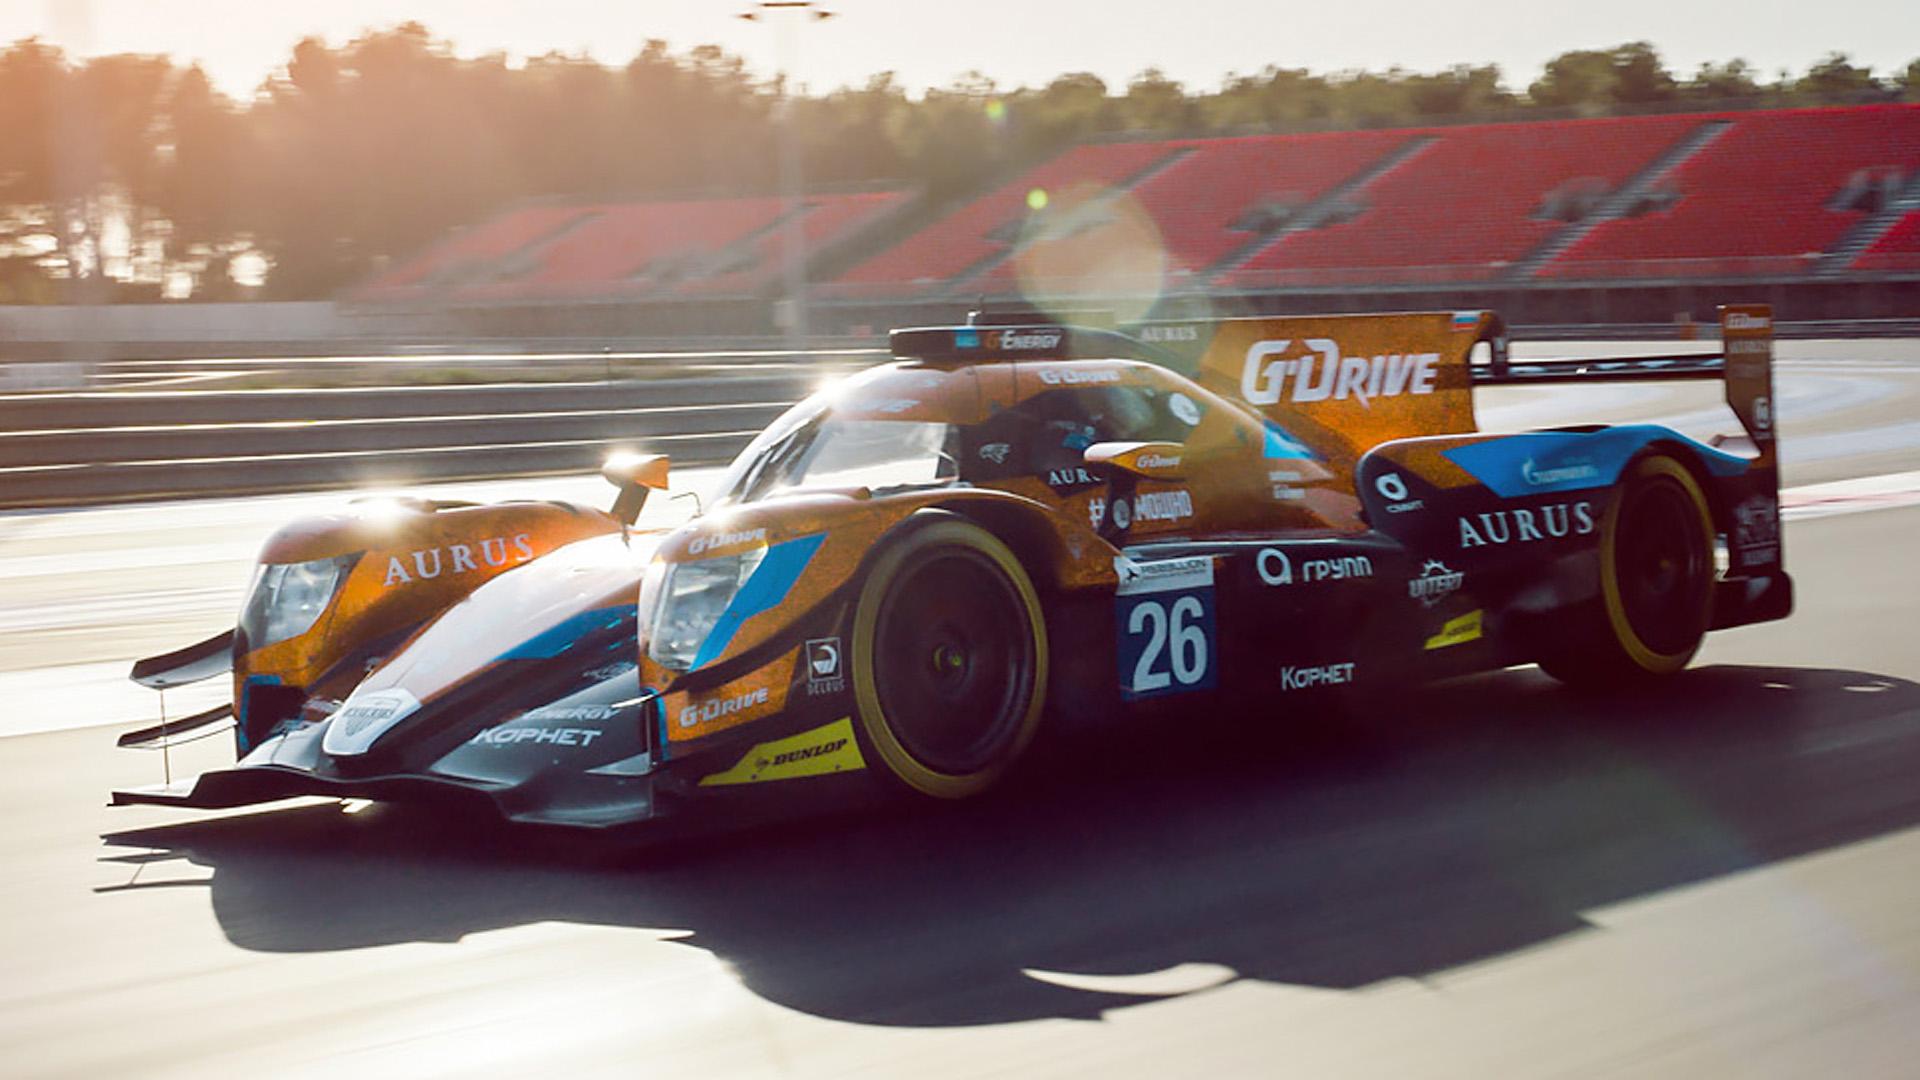 Aurus 01 G-Drive Racing